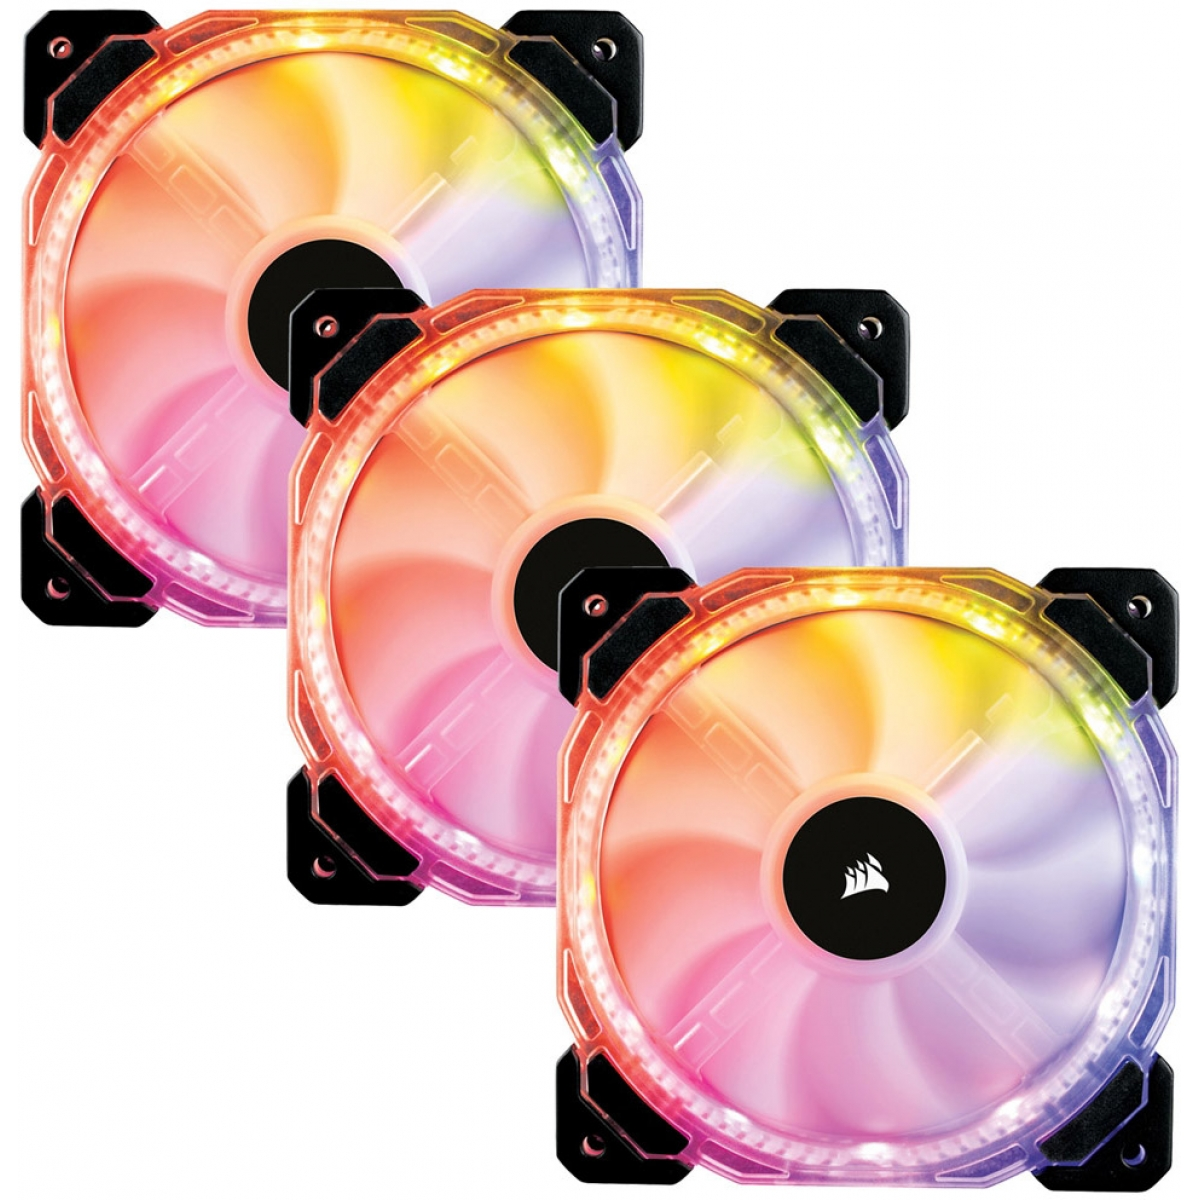 Kit Fan com 3 Unidades Corsair HD120 RGB, 120mm, com Controlador, CO-9050067-WW